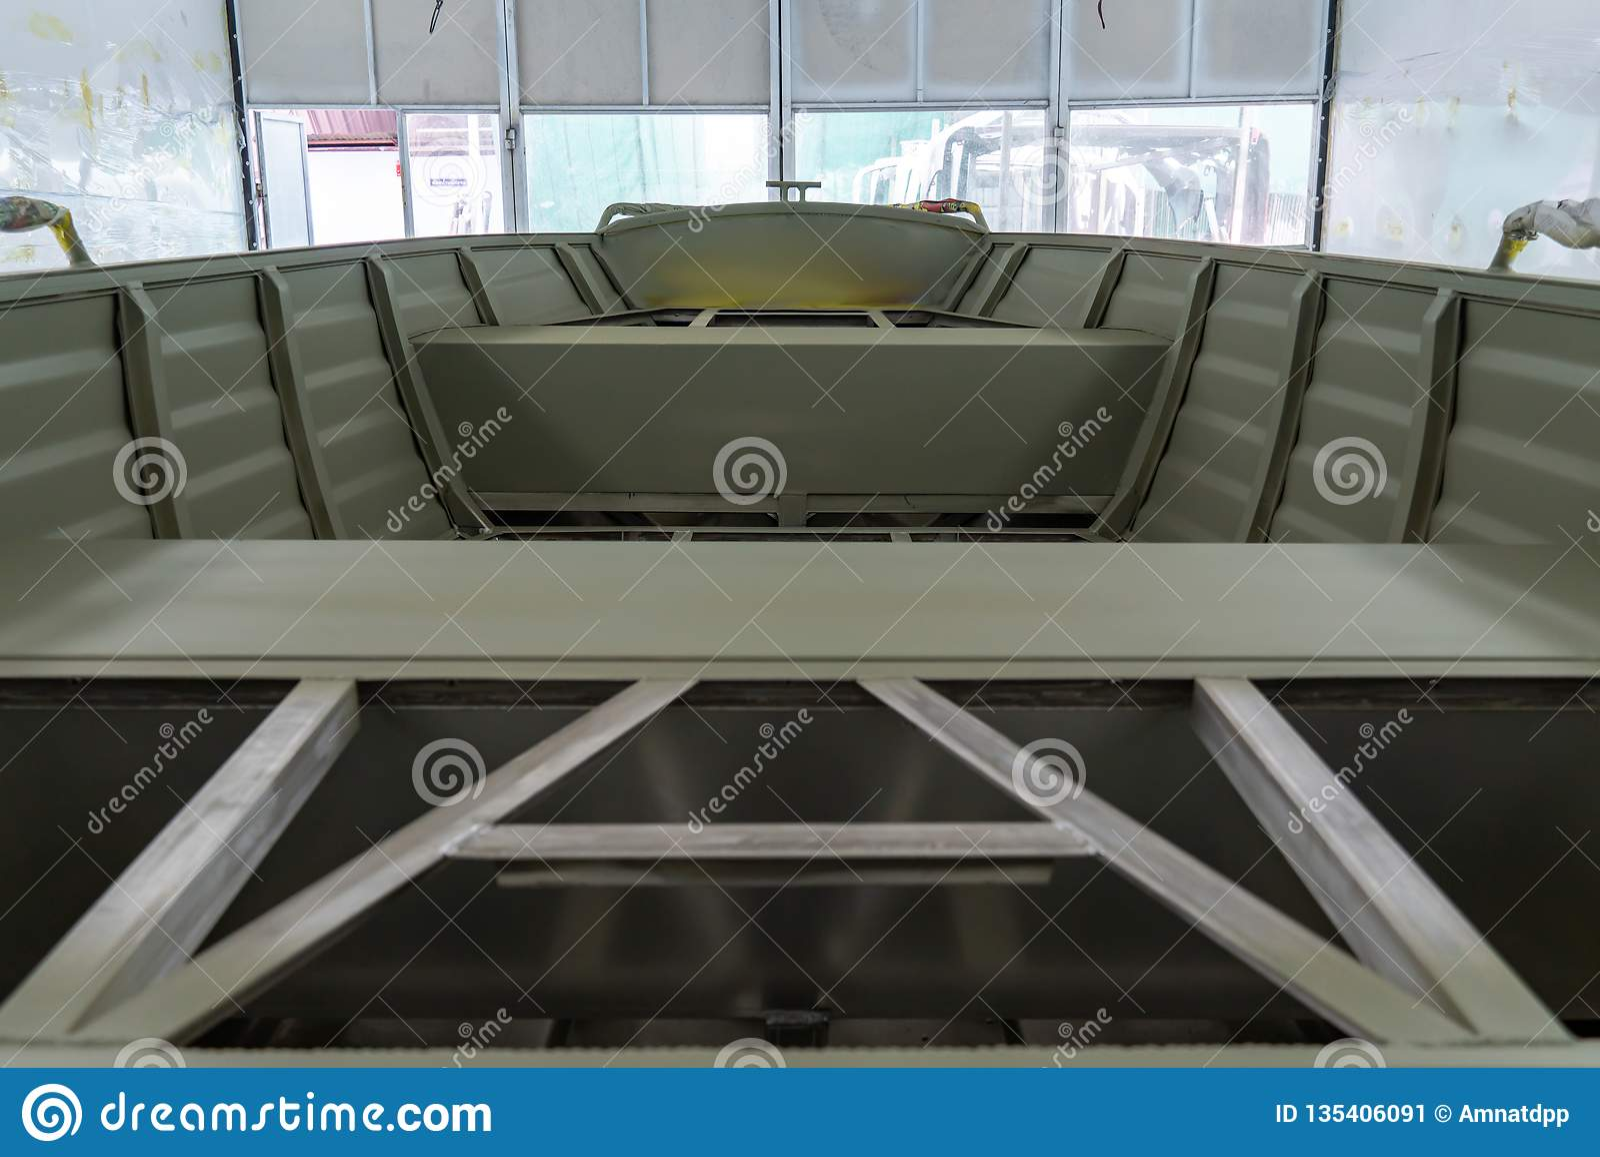 Aluminum Boat Painting Procedure At Service Center Stock